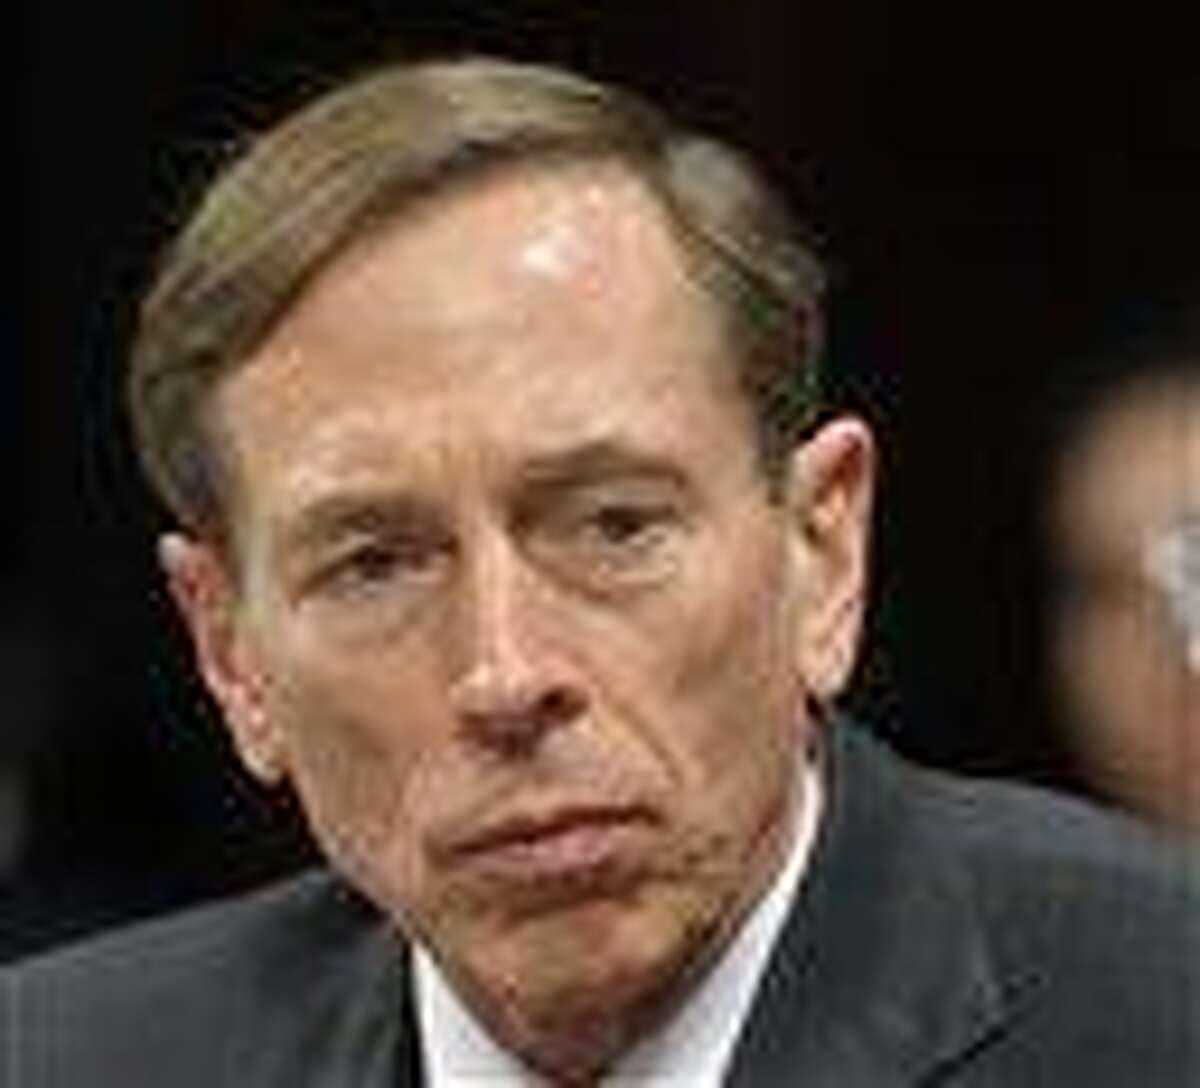 FILE - This Feb. 2, 2012 file photo shows CIA Director David Petraeus testifying on Capitol Hill in Washington. Petraeus has resigned because of an extramarital affair. (AP Photo/Cliff Owen, File)